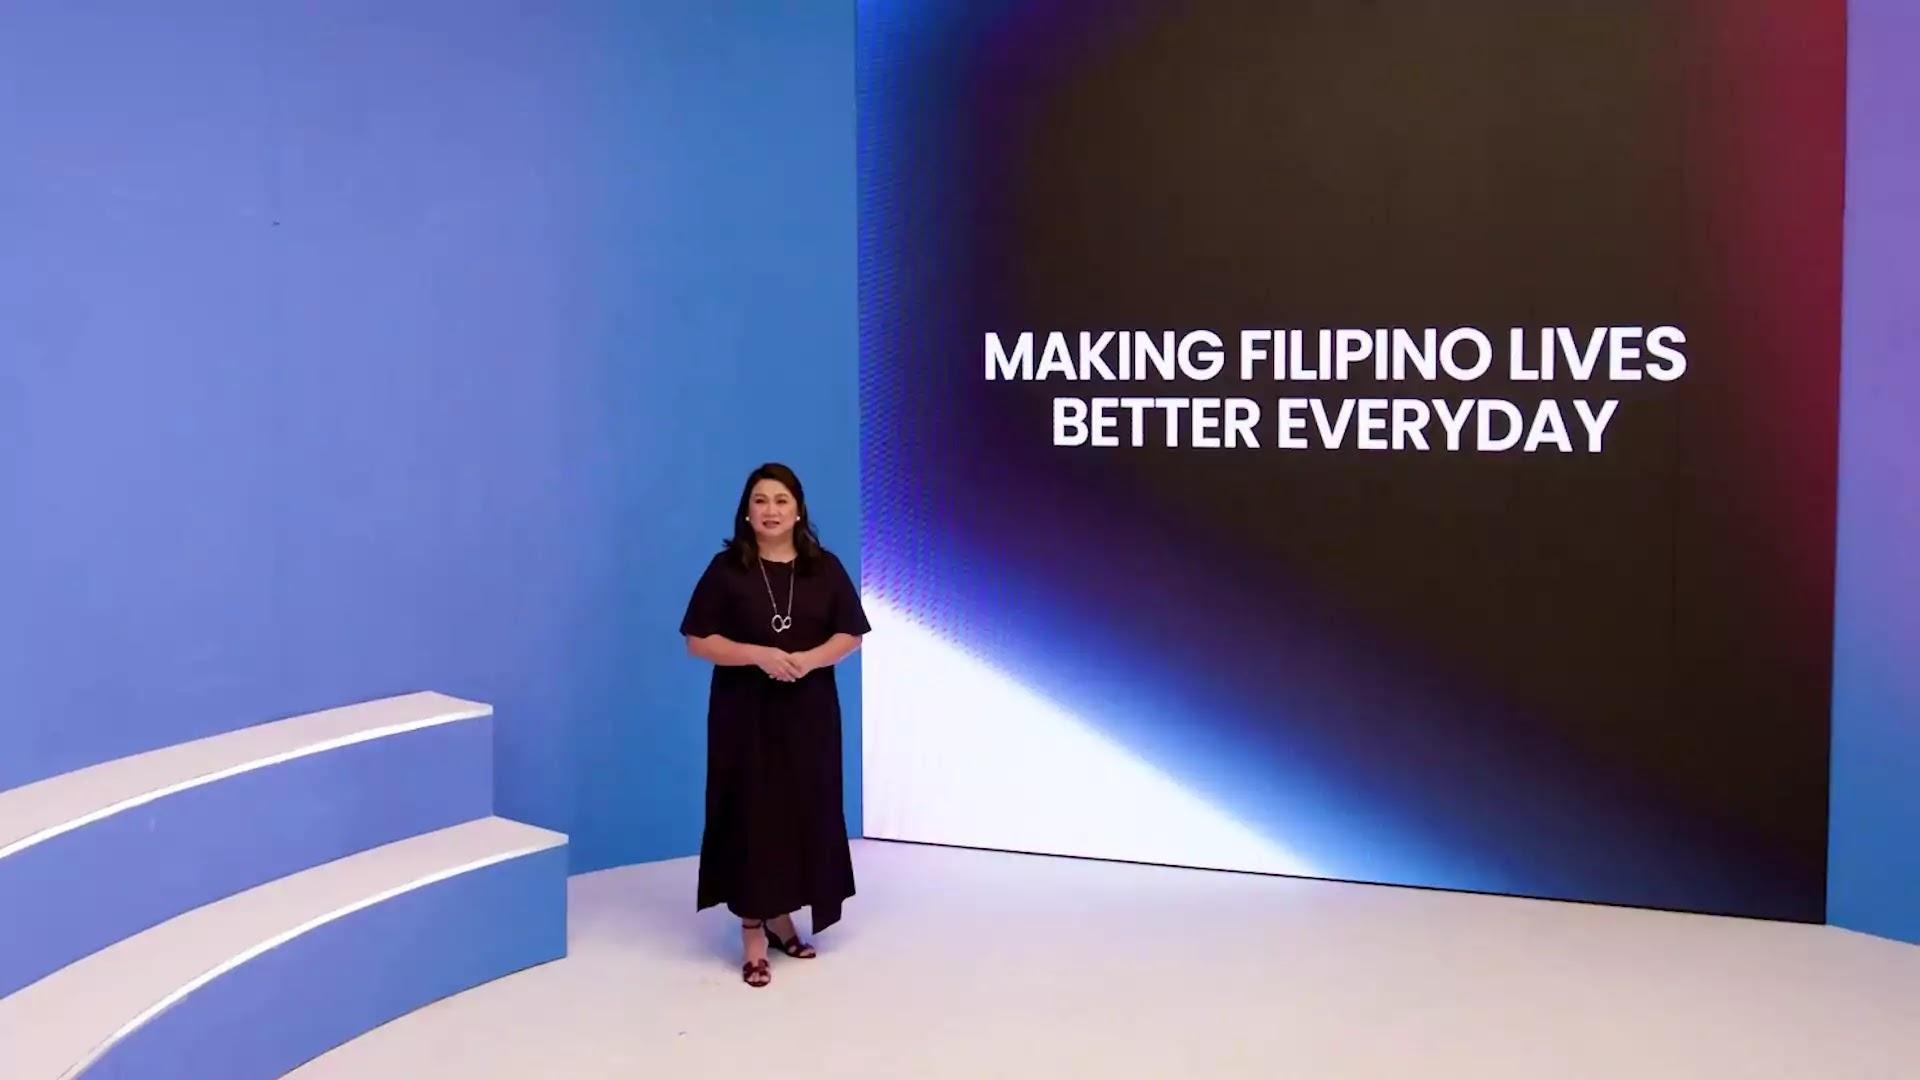 Martha Sazon - President and CEO